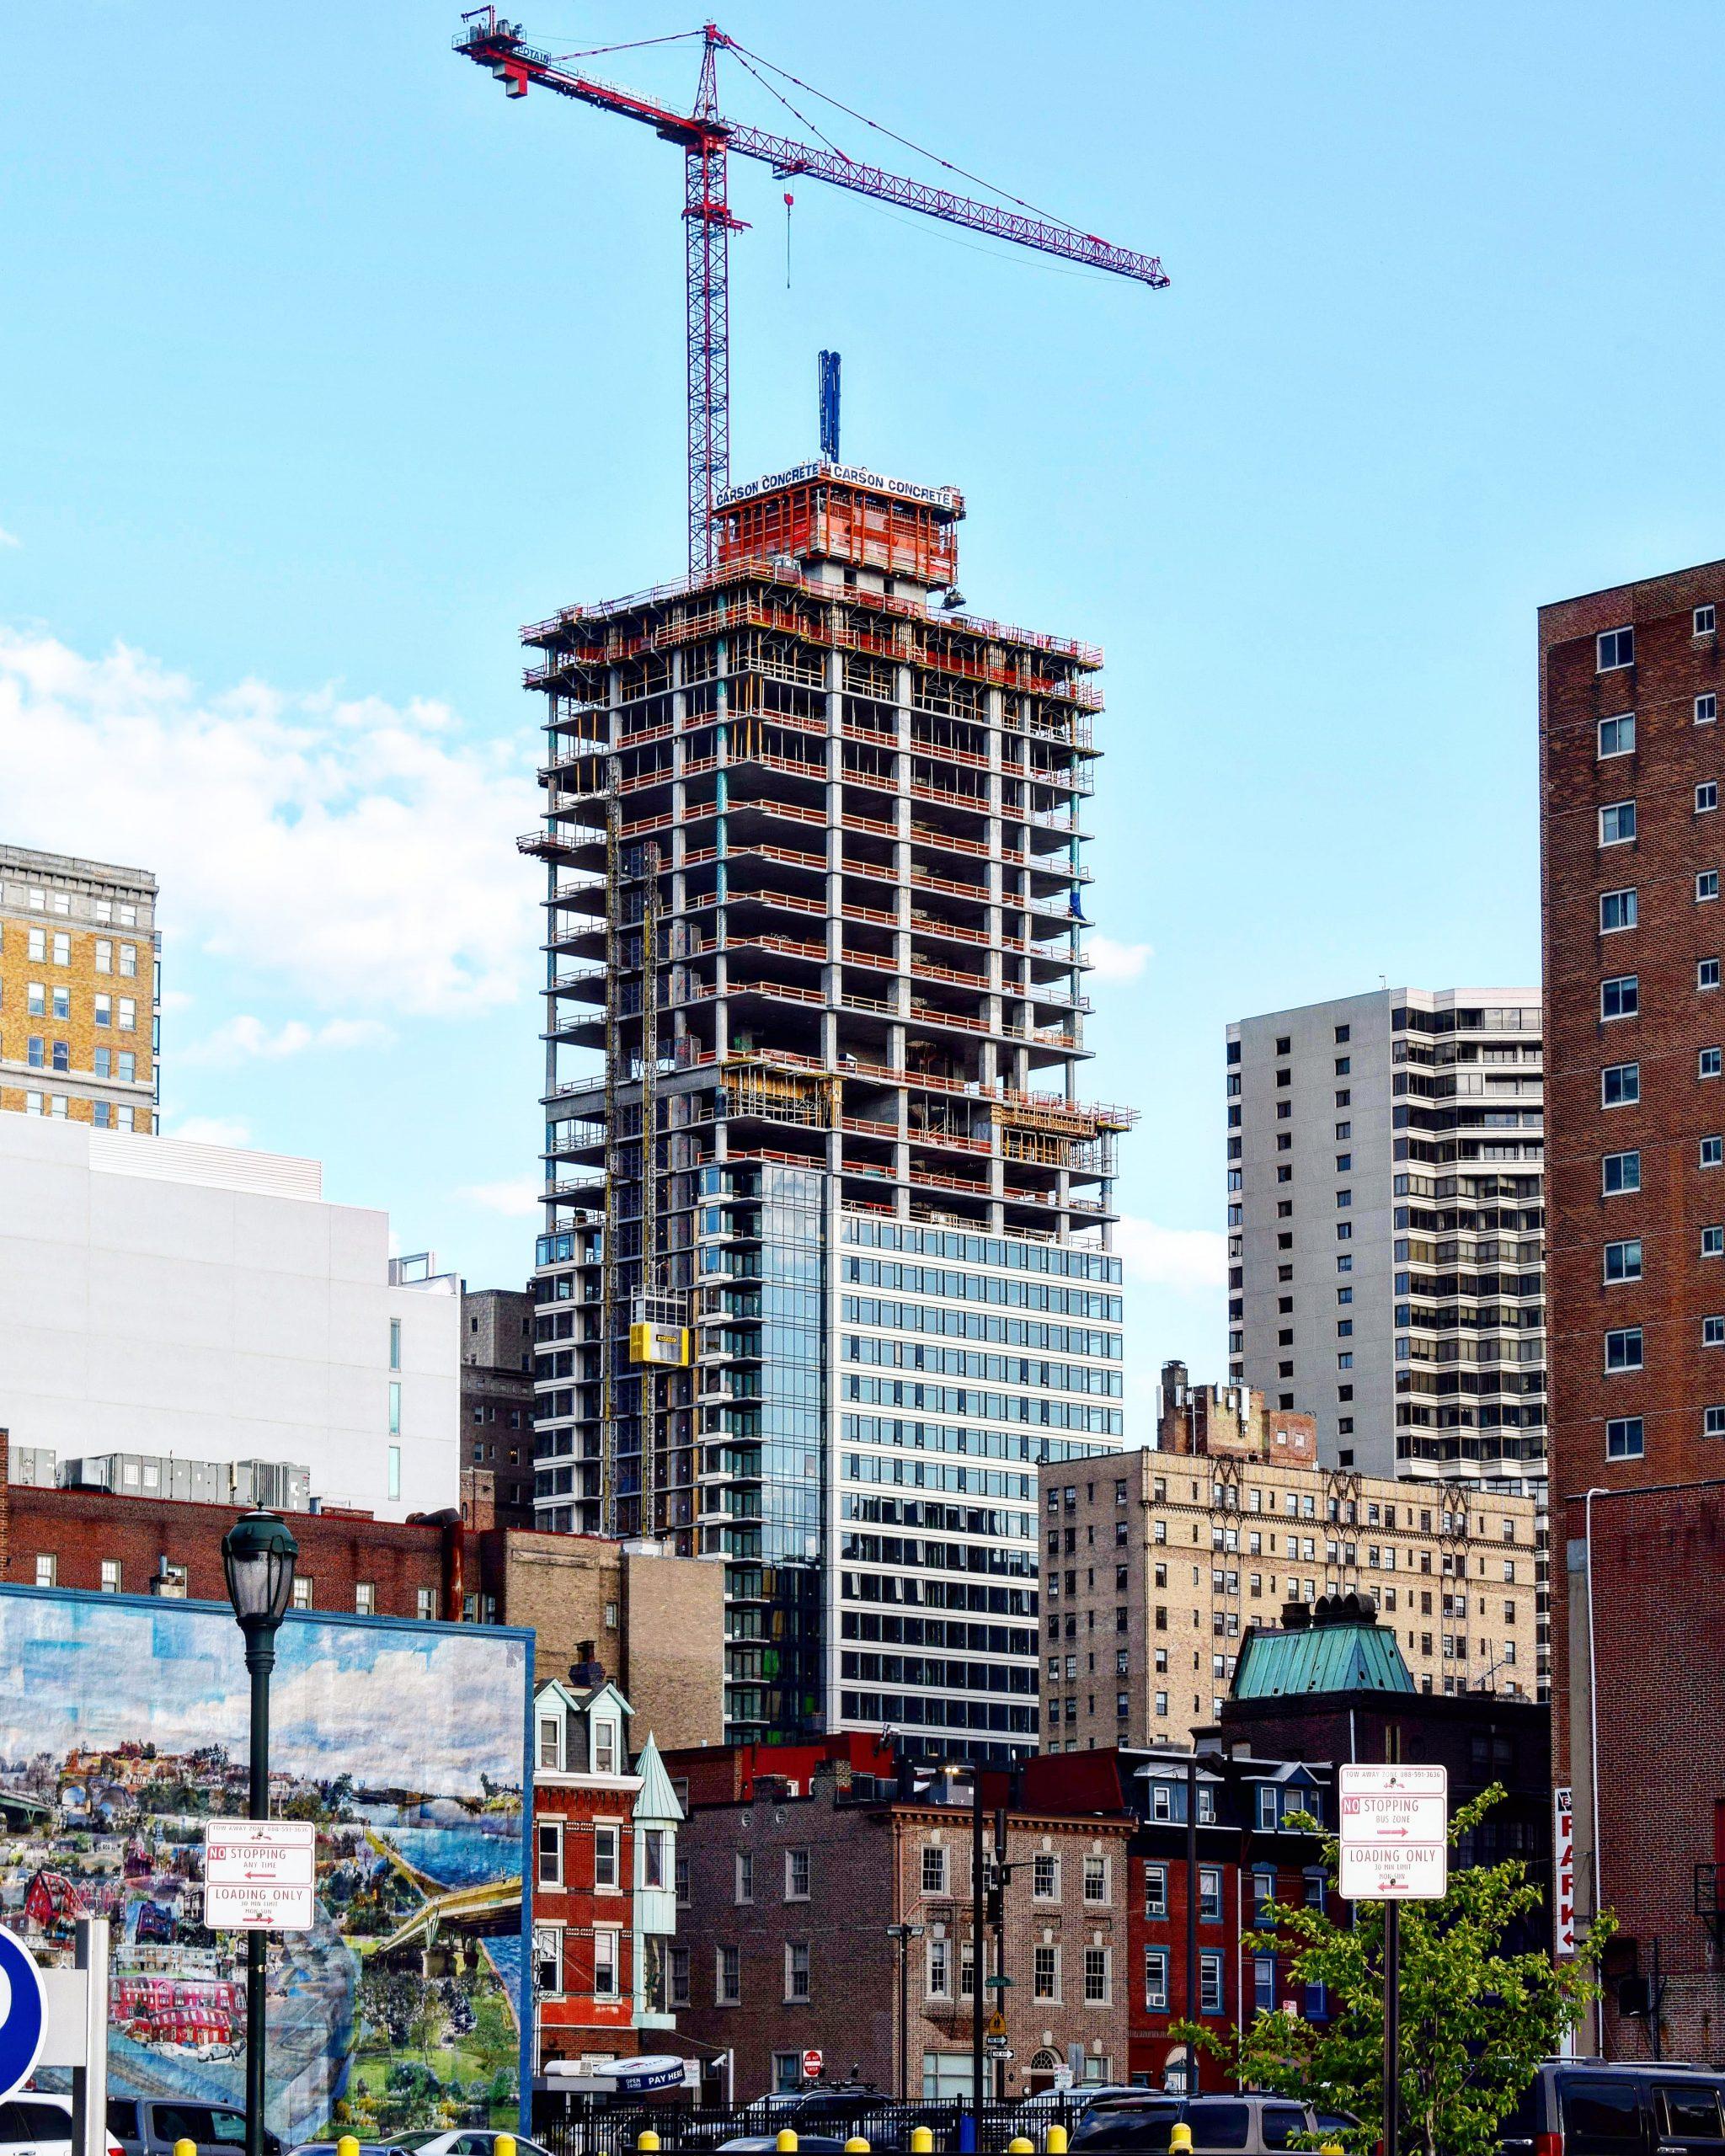 The Laurel Rittenhouse Square from Market Street. Photo by Thomas Koloski